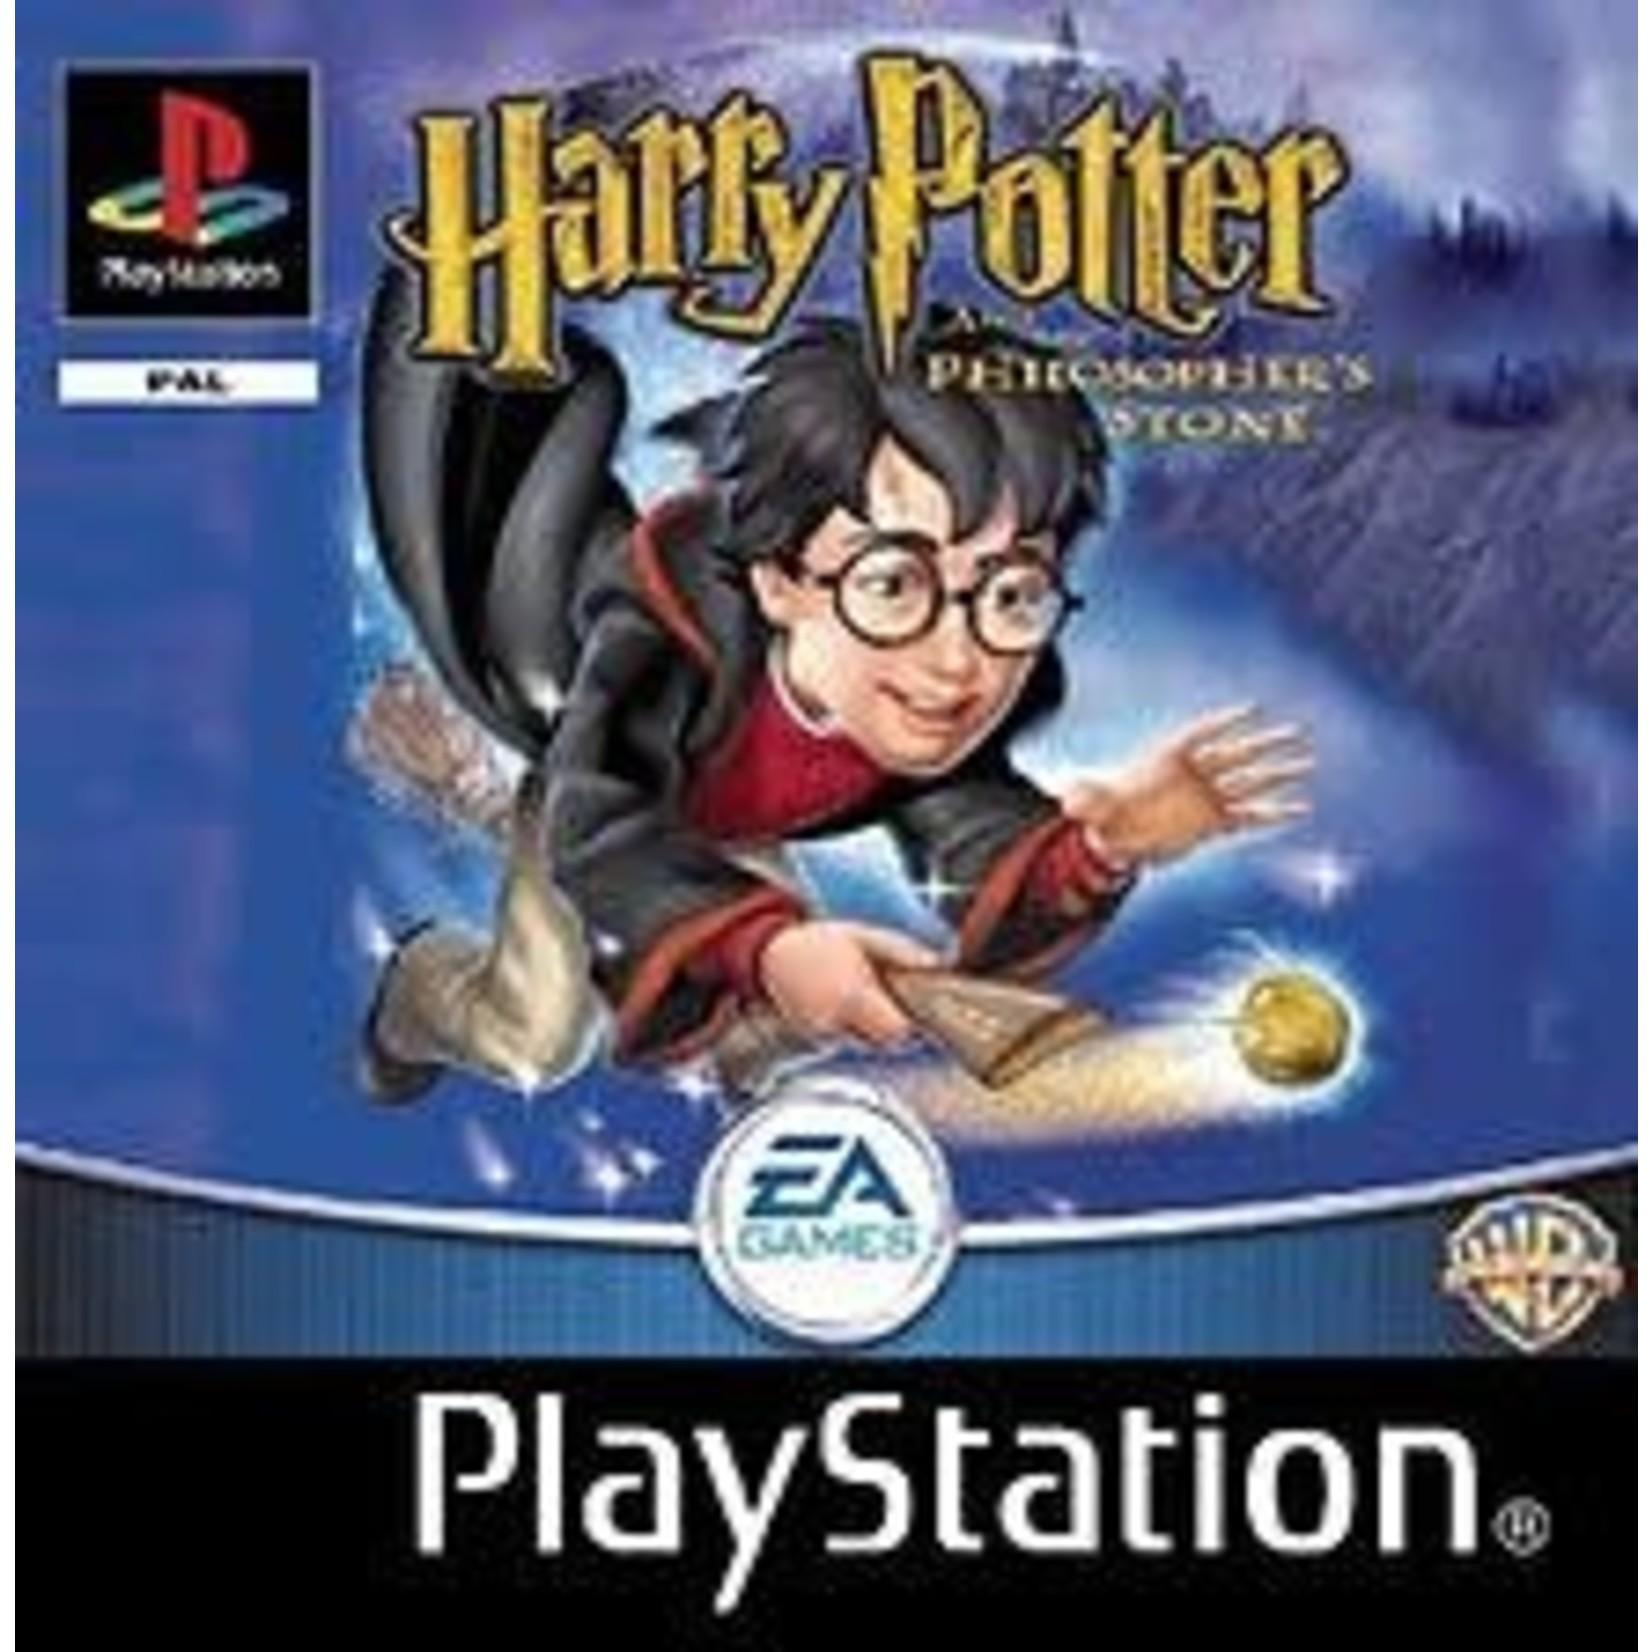 PS1U-Harry Potter Sorcerers Stone